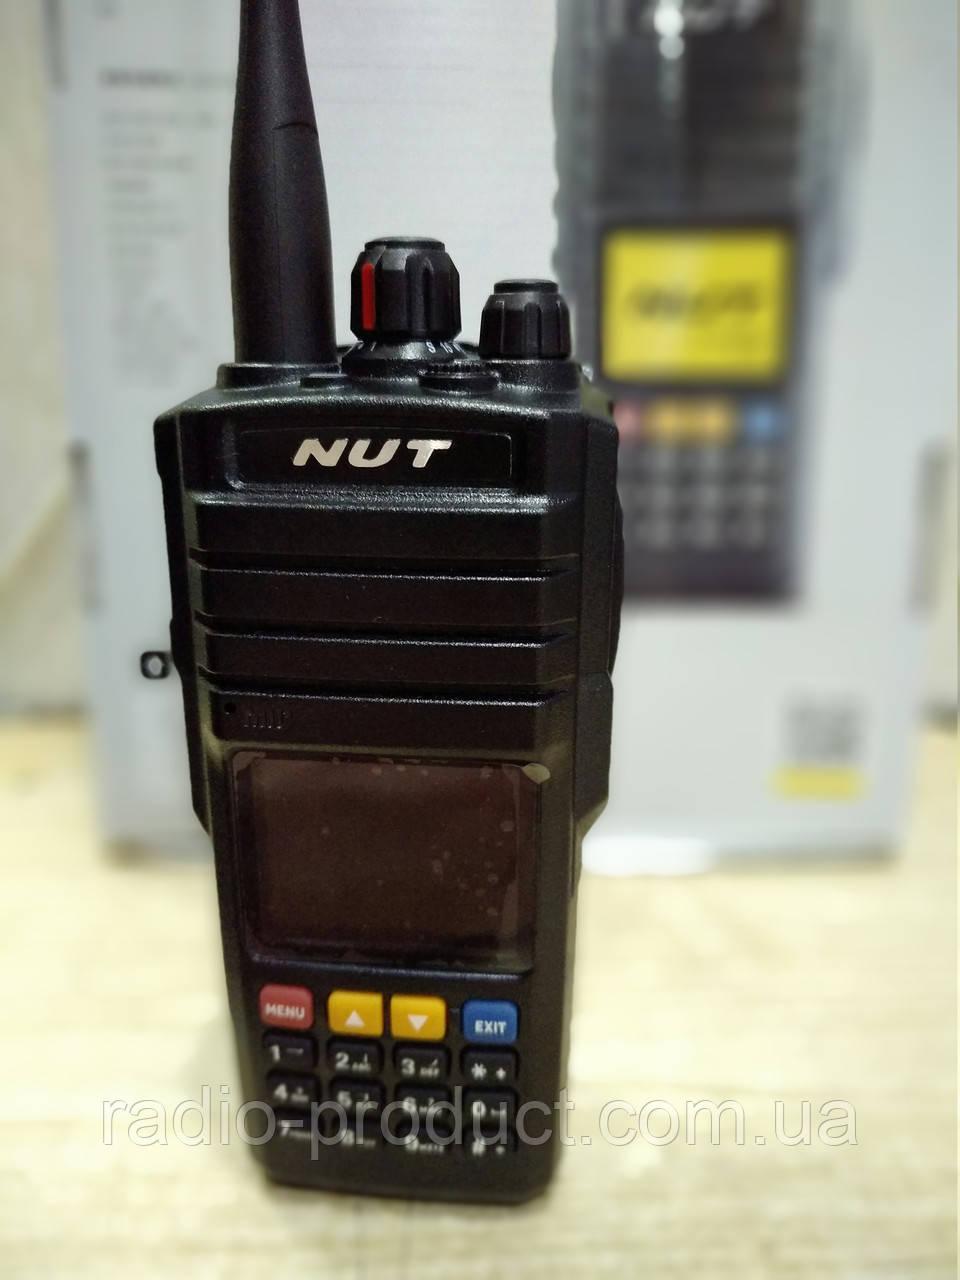 Quansheng AT-D5 (TG-D5) DMR, аналогово-цифровая радиостанция